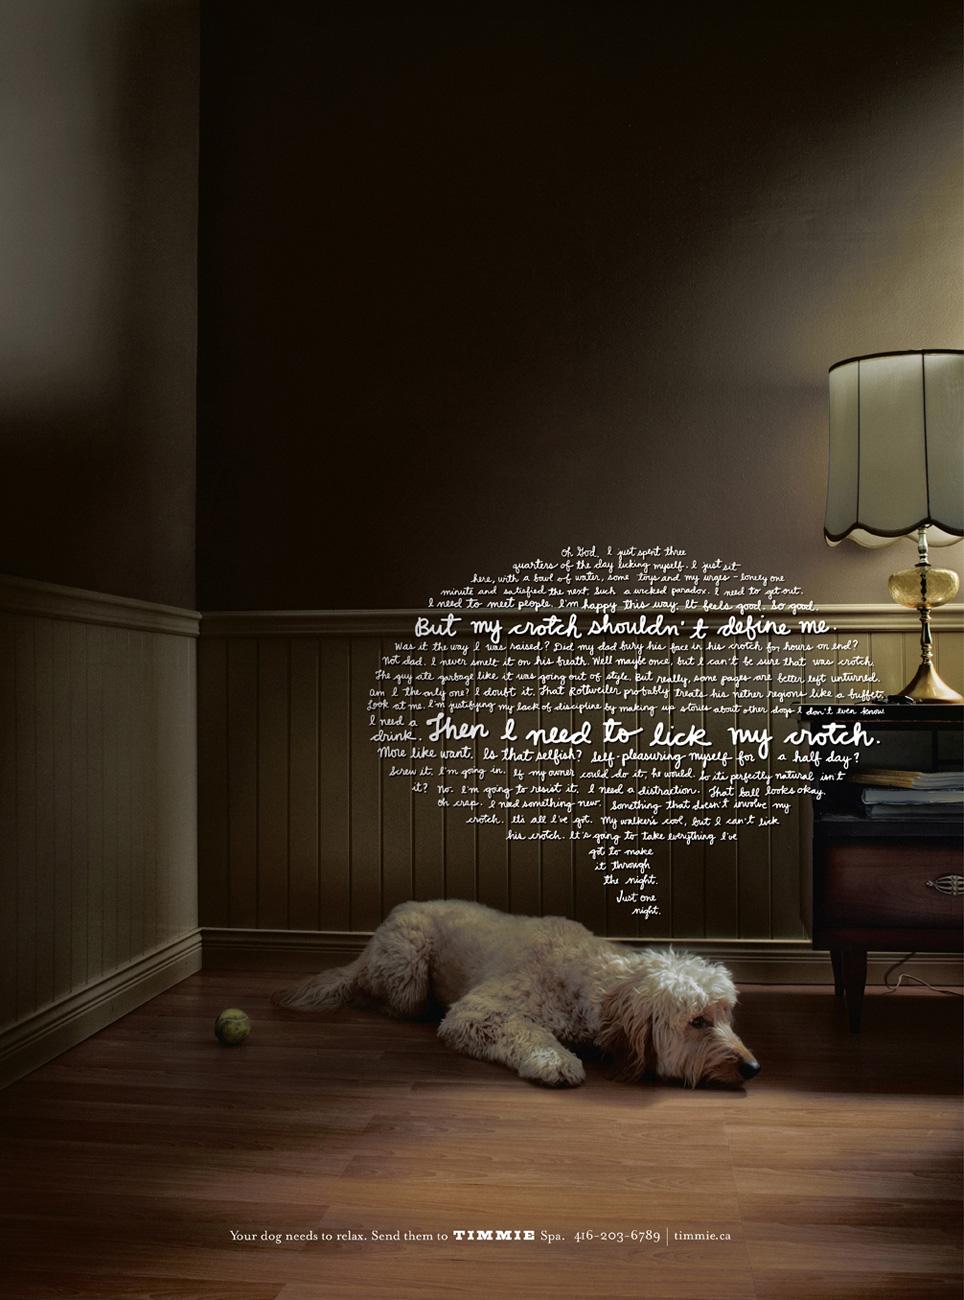 Dog food ad funny